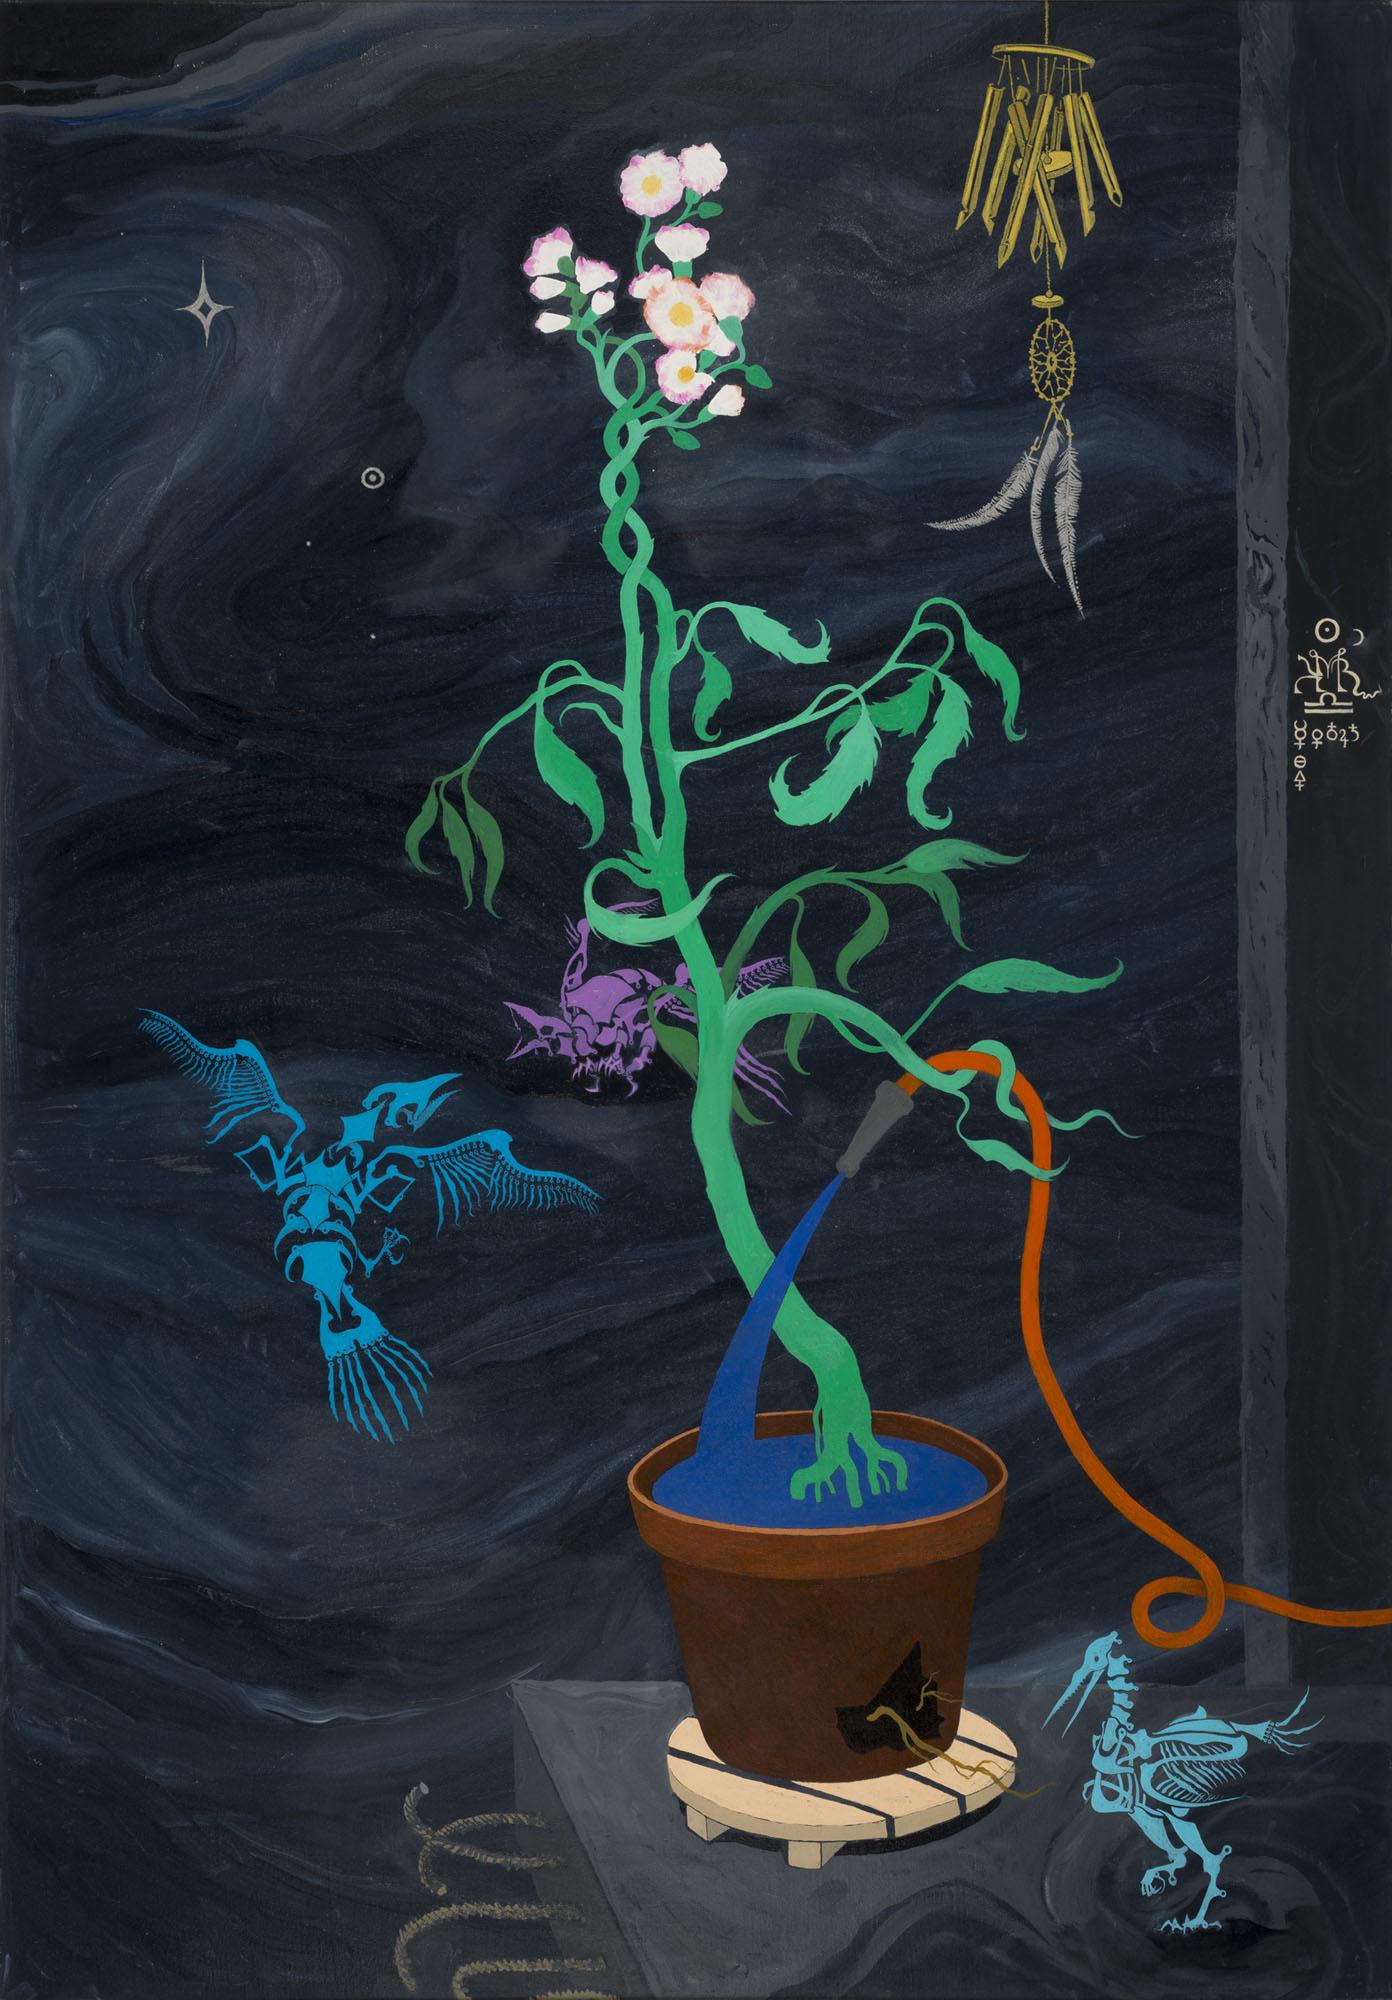 Mi Kafchin   Self-Sufficient Plant , 2016  Oil on canvas  181 x 126 cm  71.25 x 50 inches